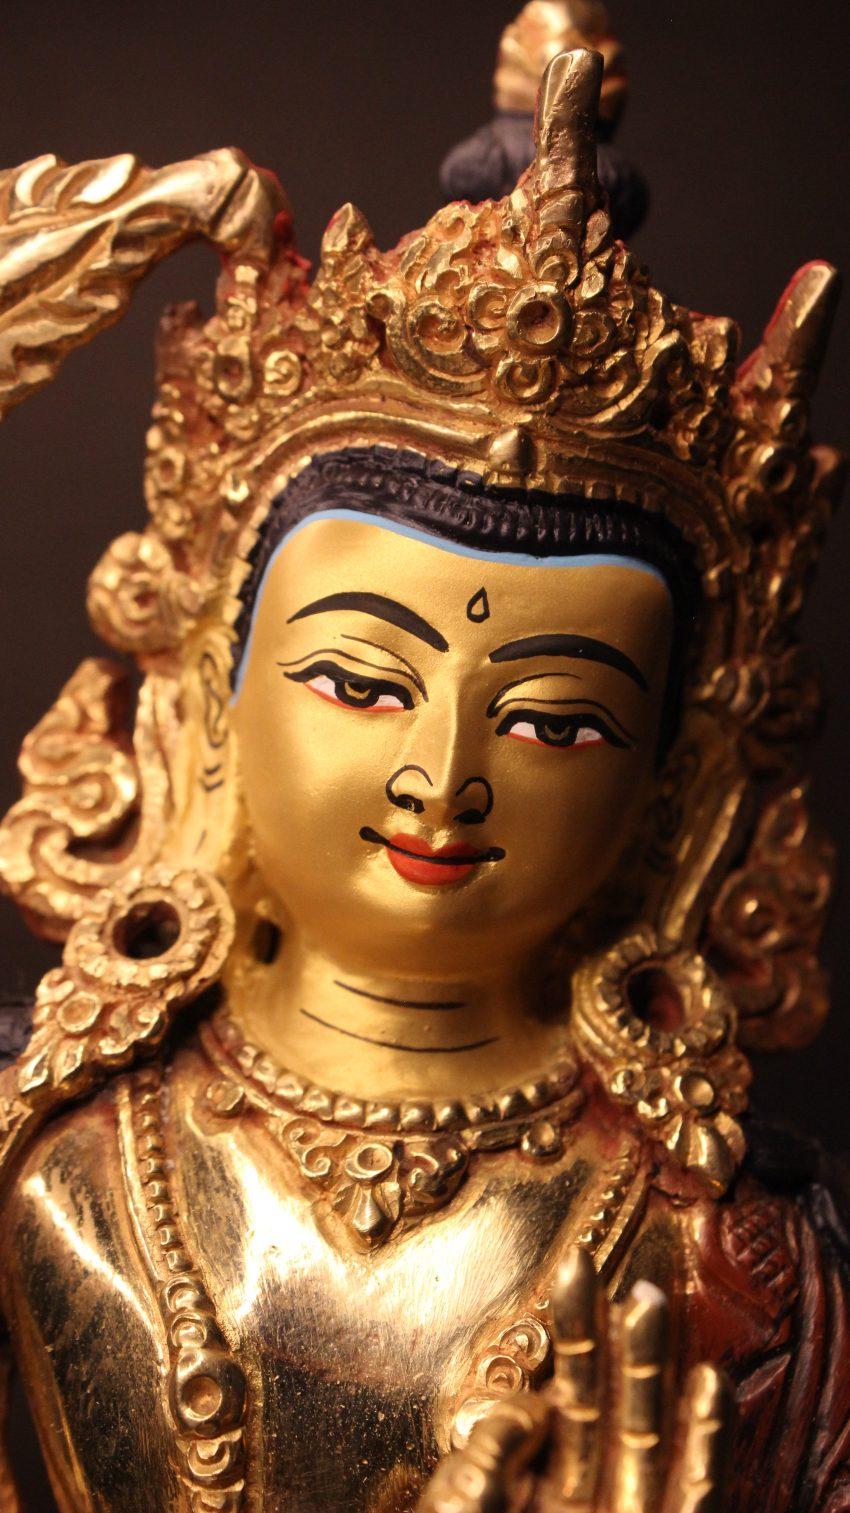 golden manjushree figurine